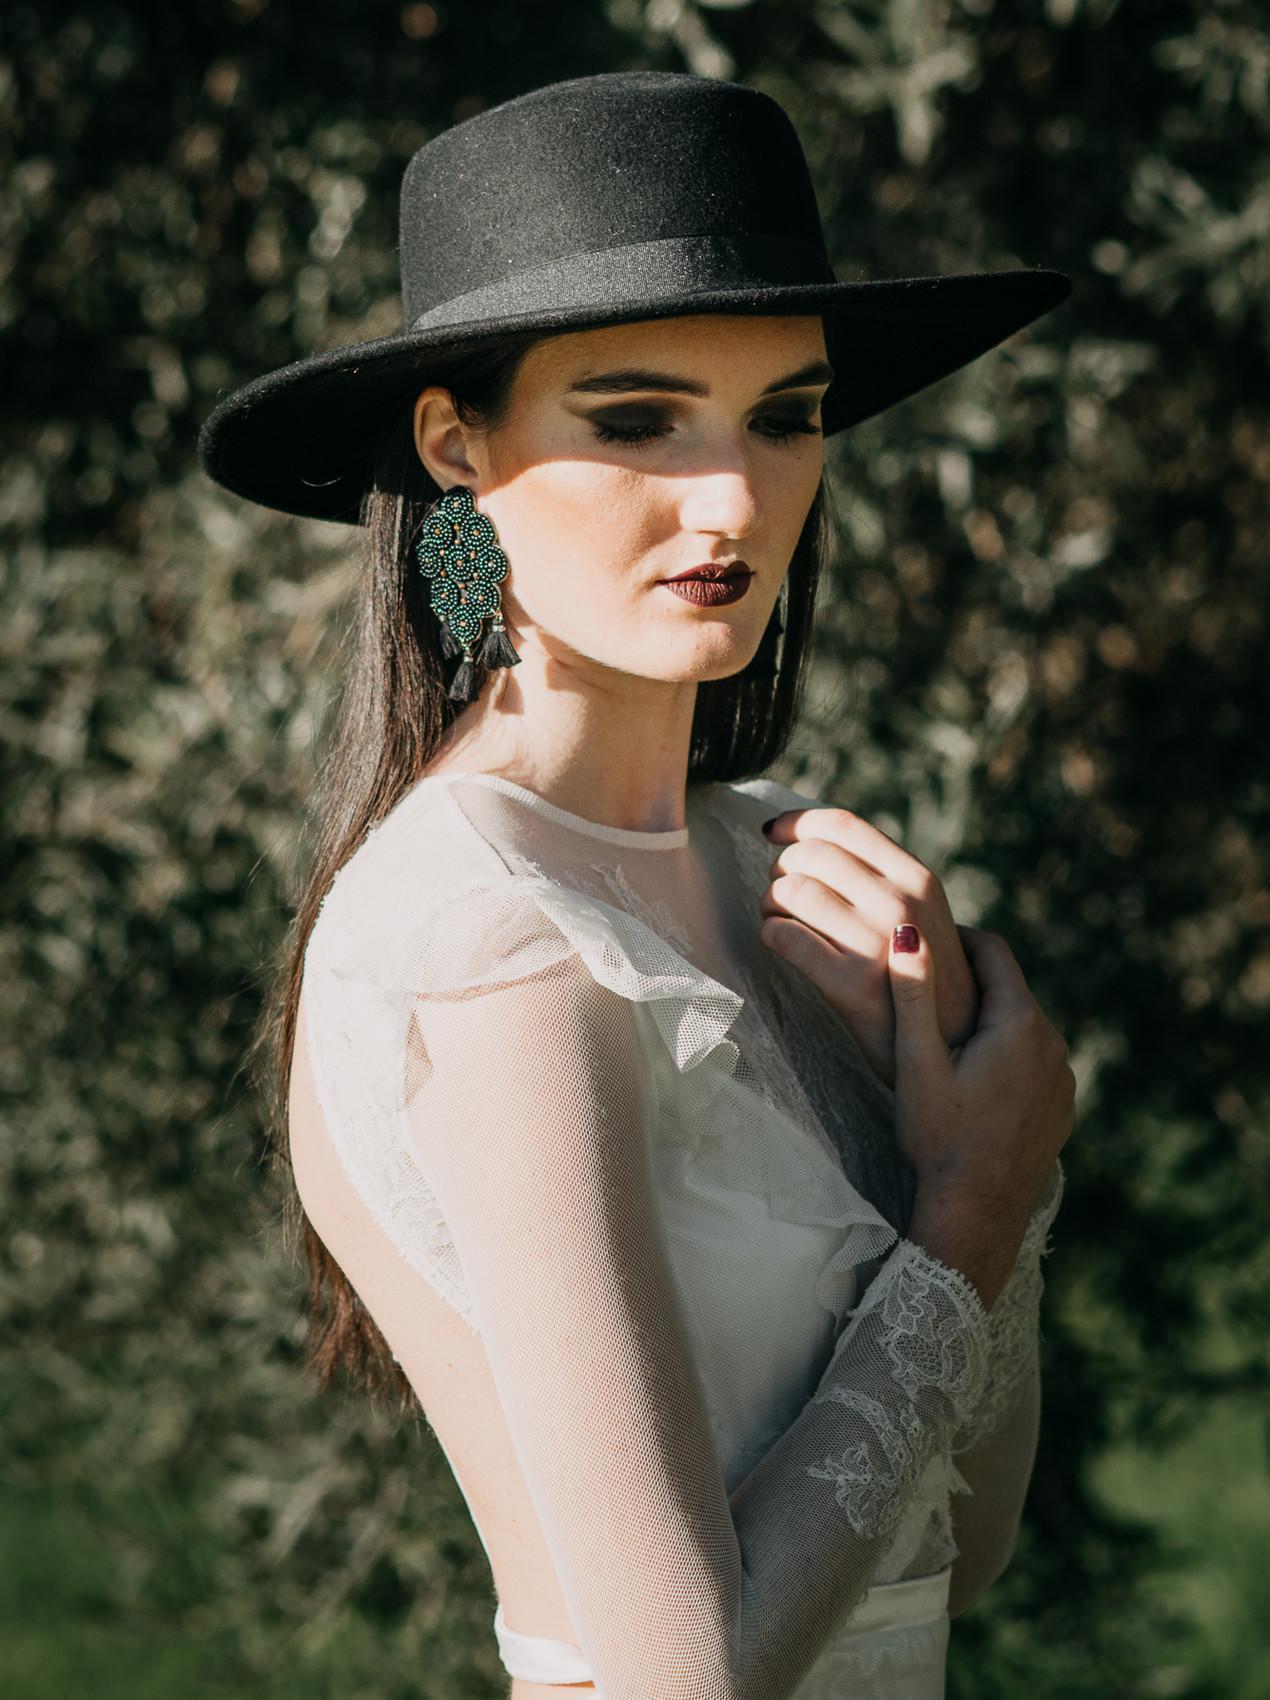 fine-art brie in Nora Sarman wedding gown by The Wedding Fox